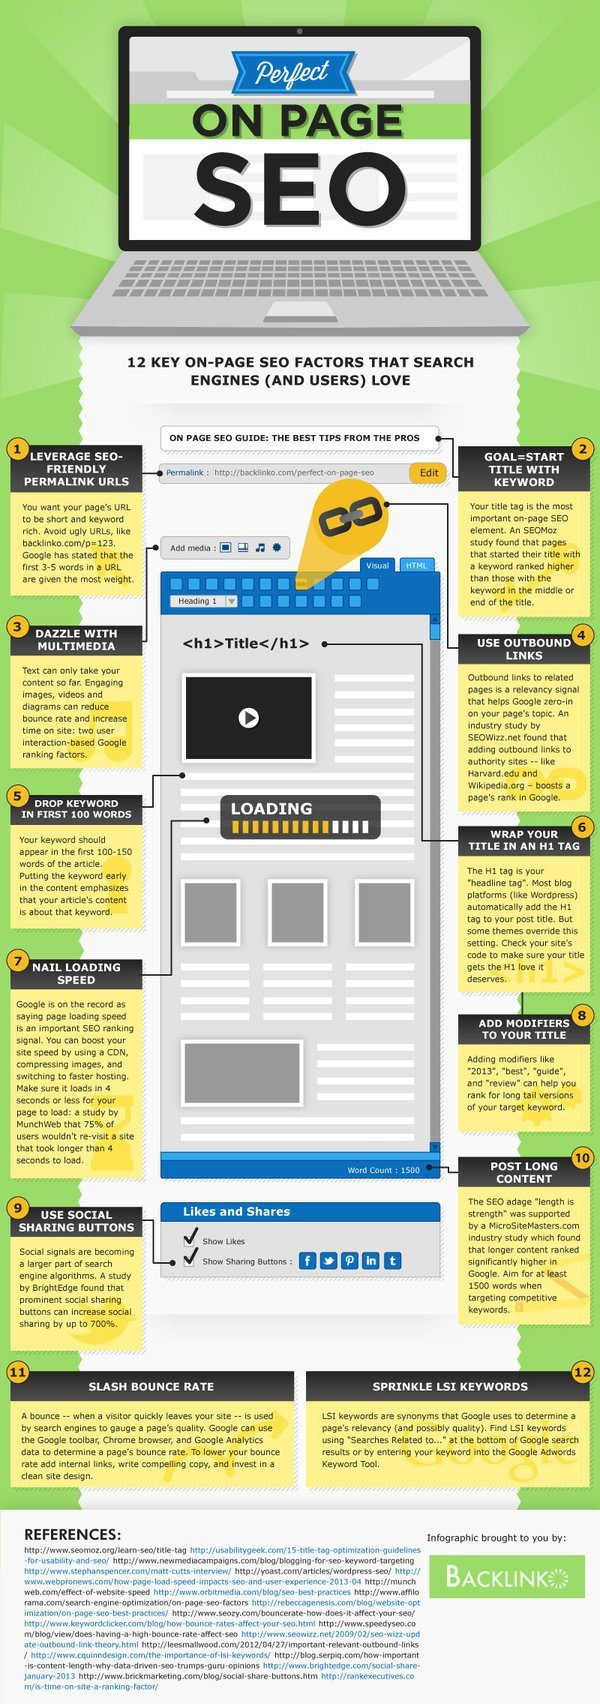 on-page seo infographic - seo copywriting